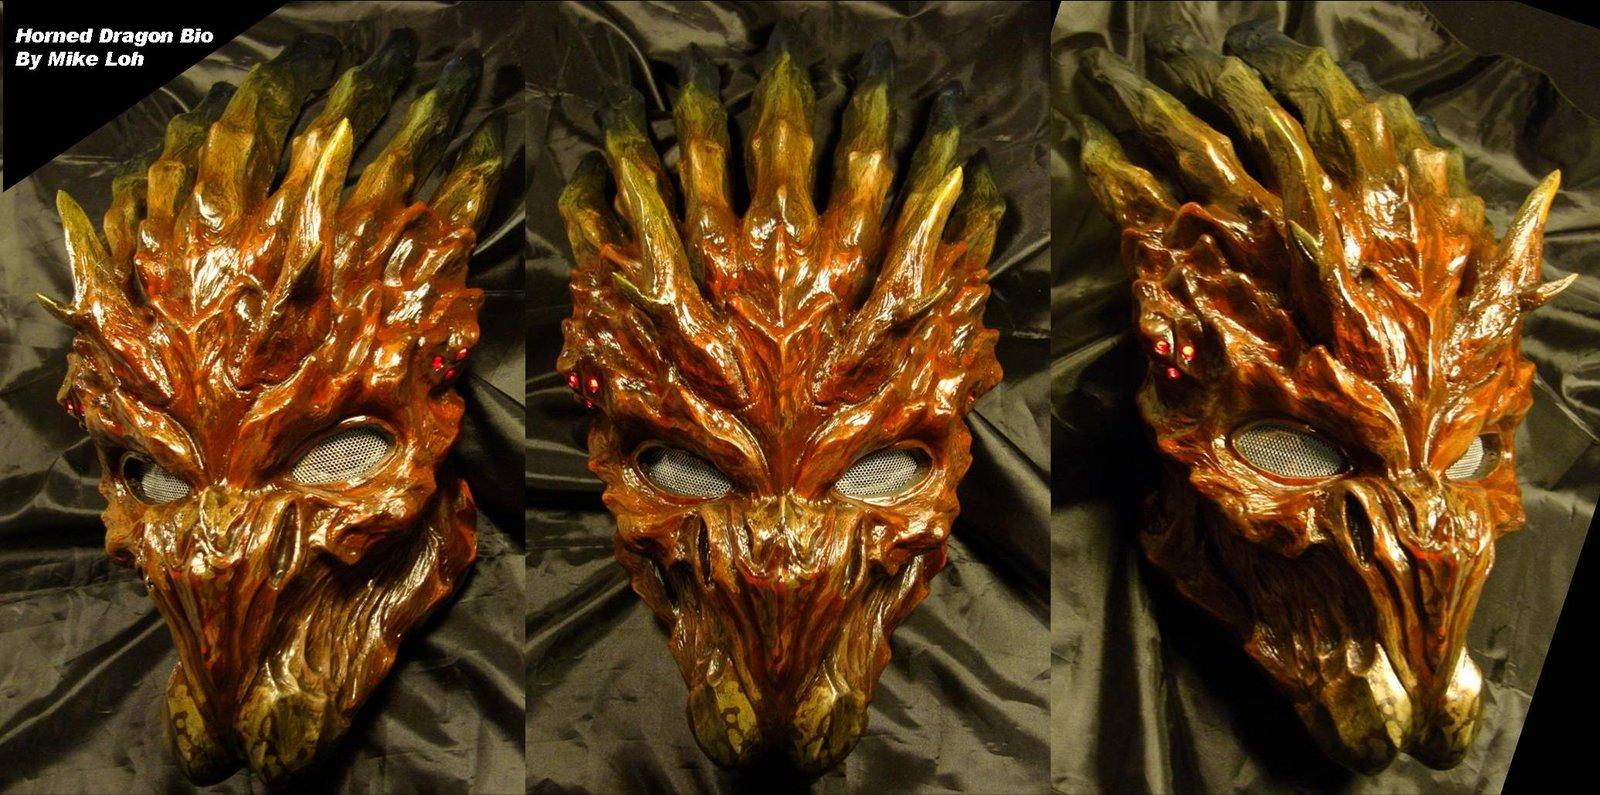 Horned_Dragon_Bio_by_MichaelLoh.jpg